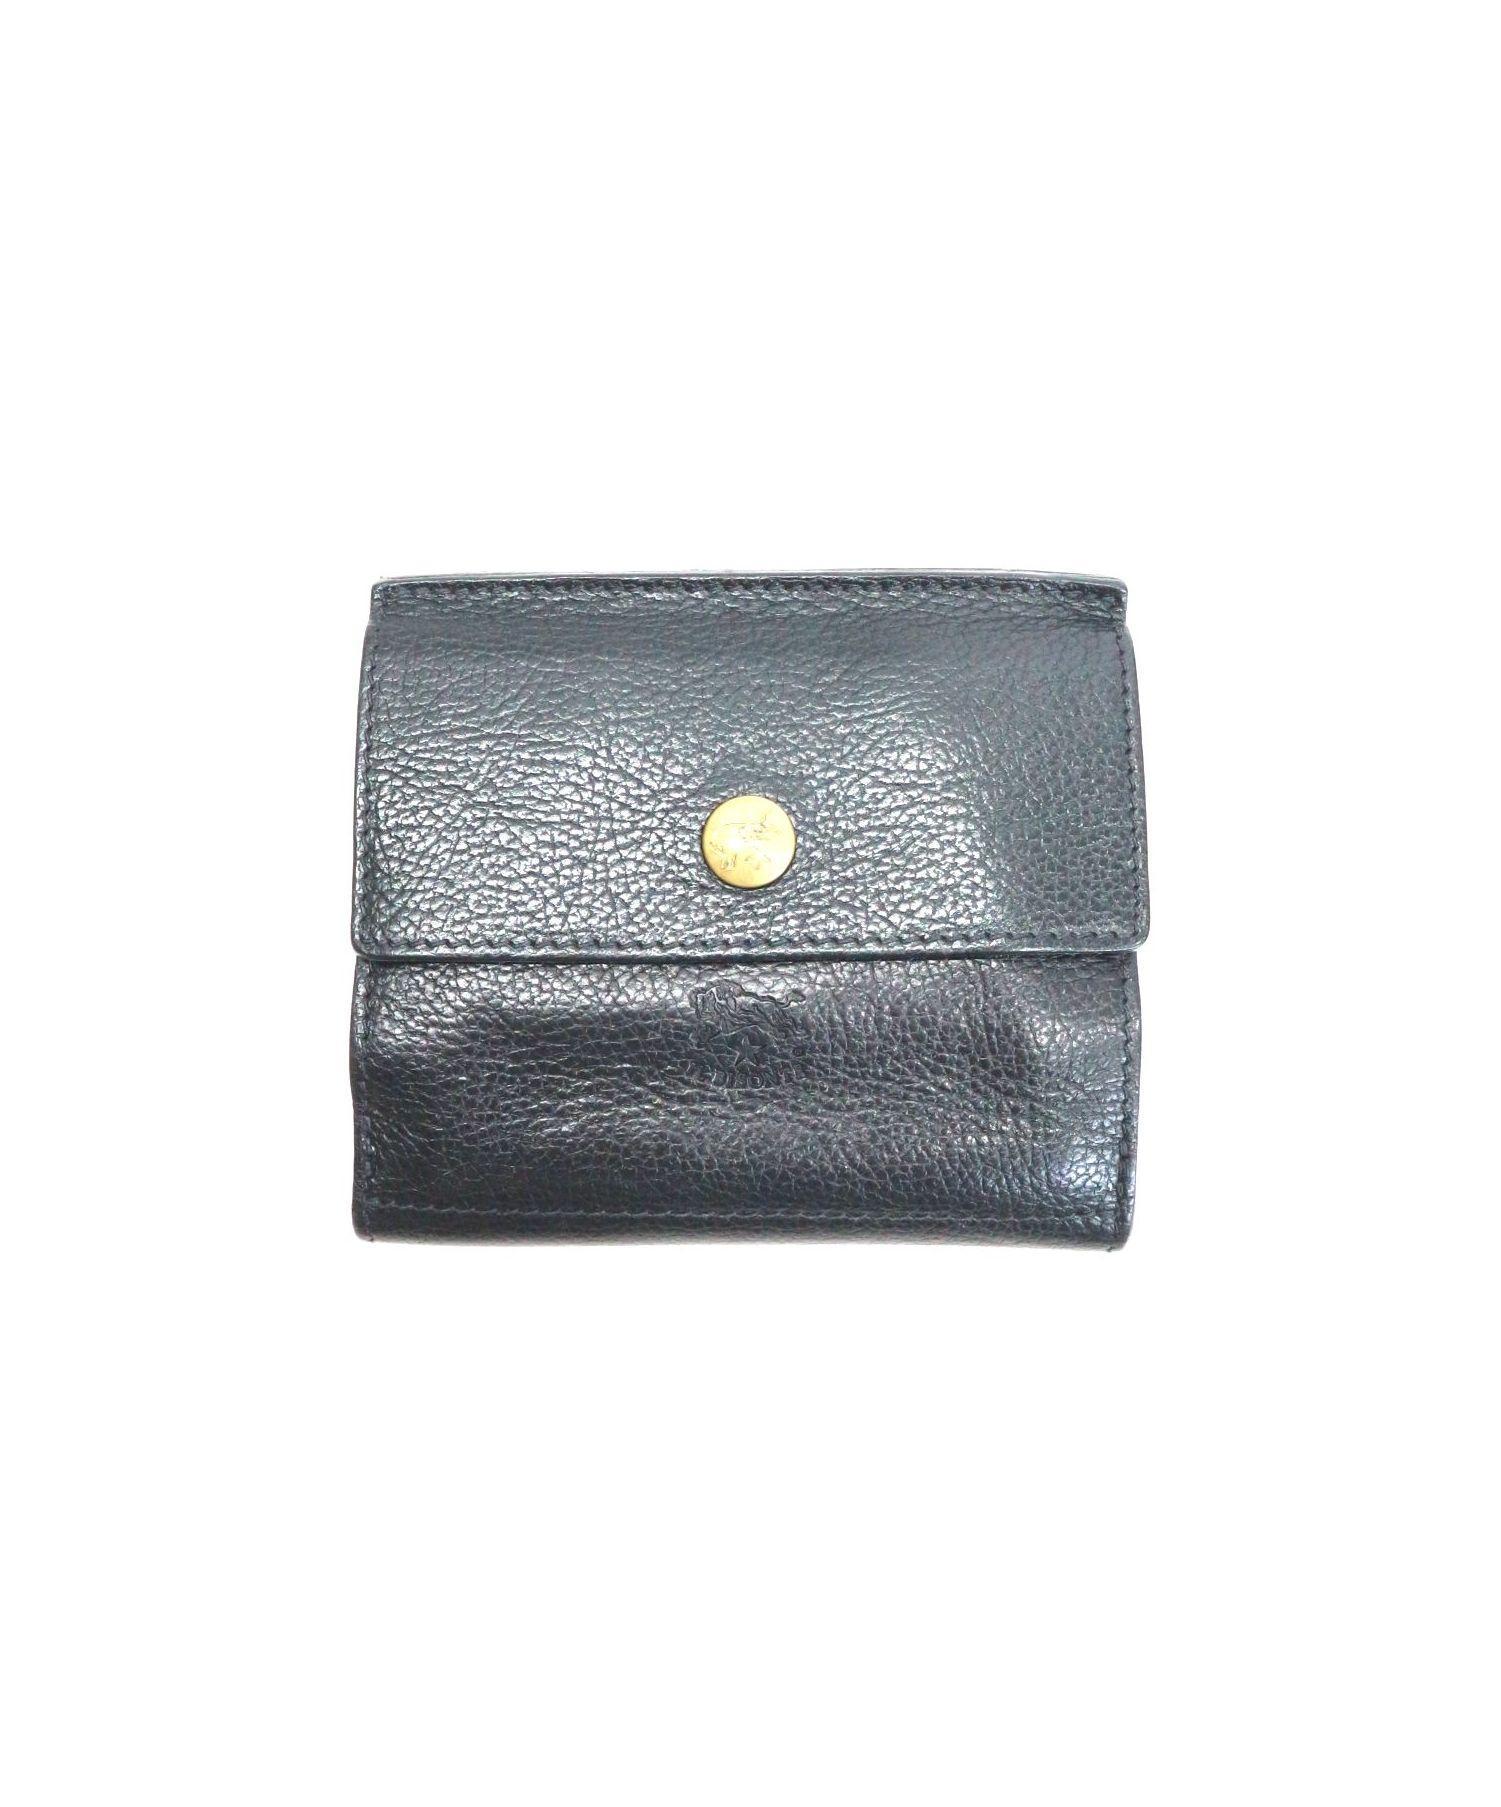 3719b3e19916 中古・古着通販】IL BISONTE (イルビゾンテ) 2つ折り財布|古着通販 ...